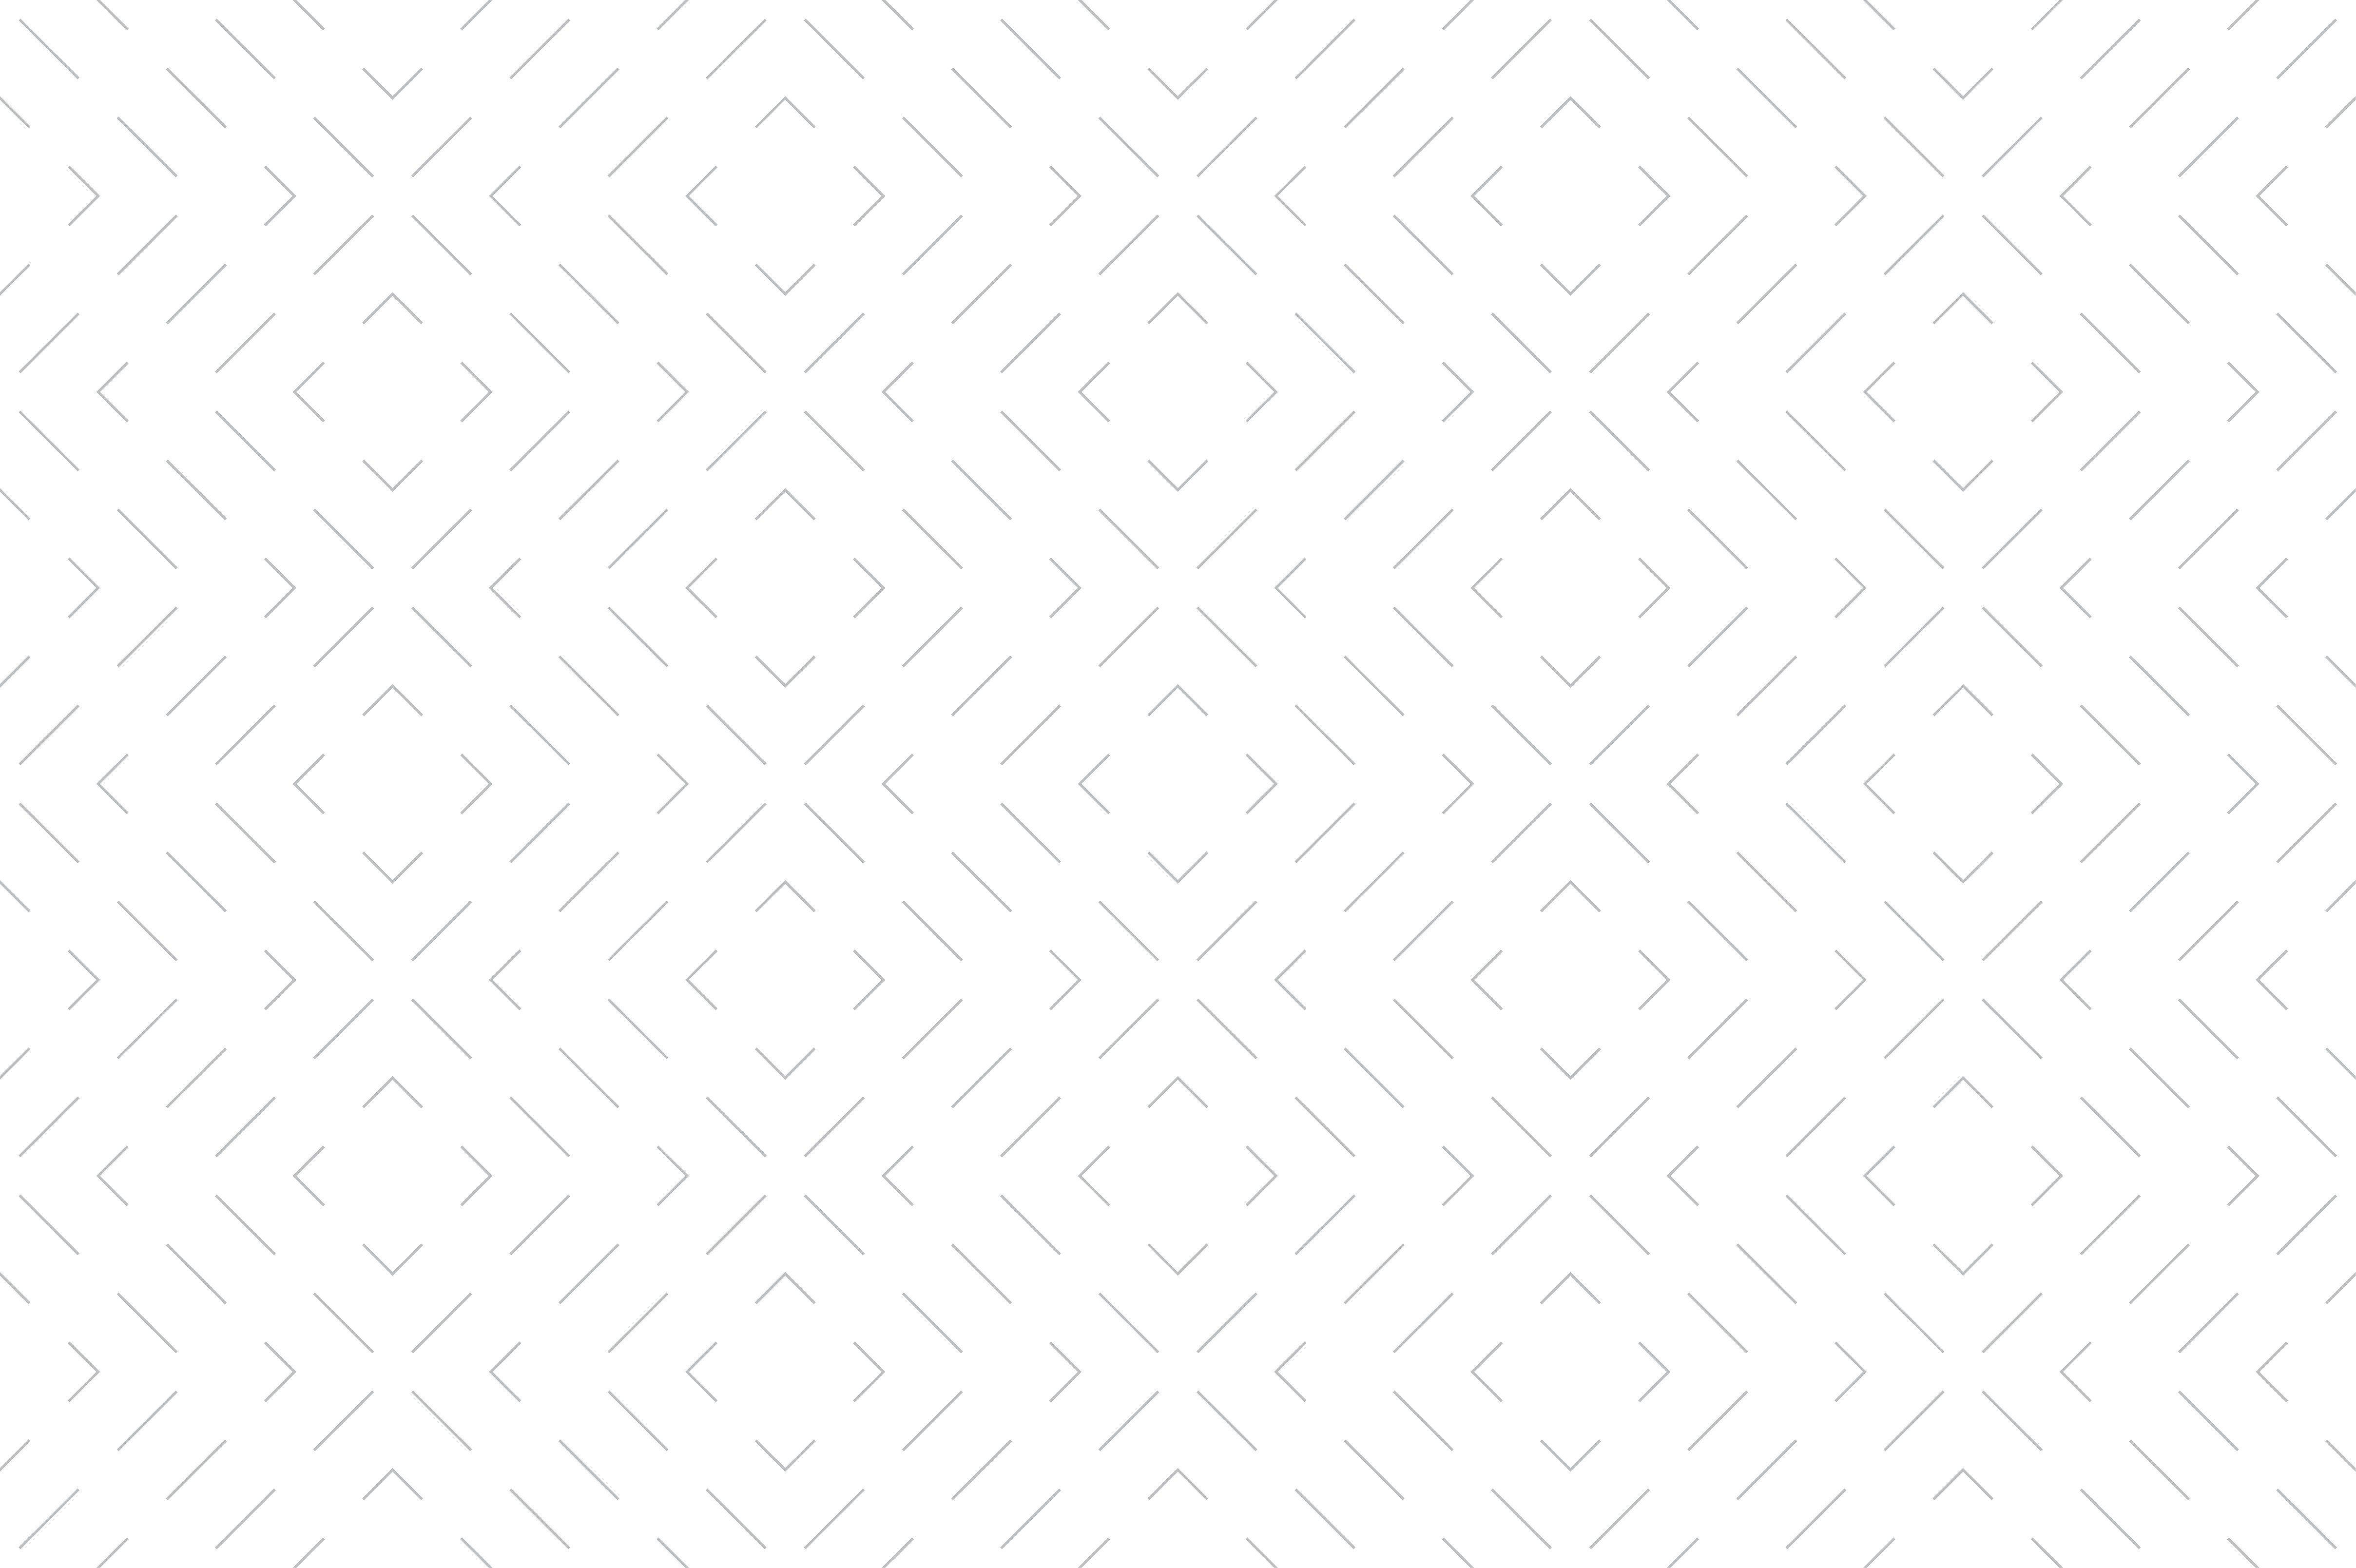 Geometric seamless backgrounds Seamless background Geometric 4834x3217